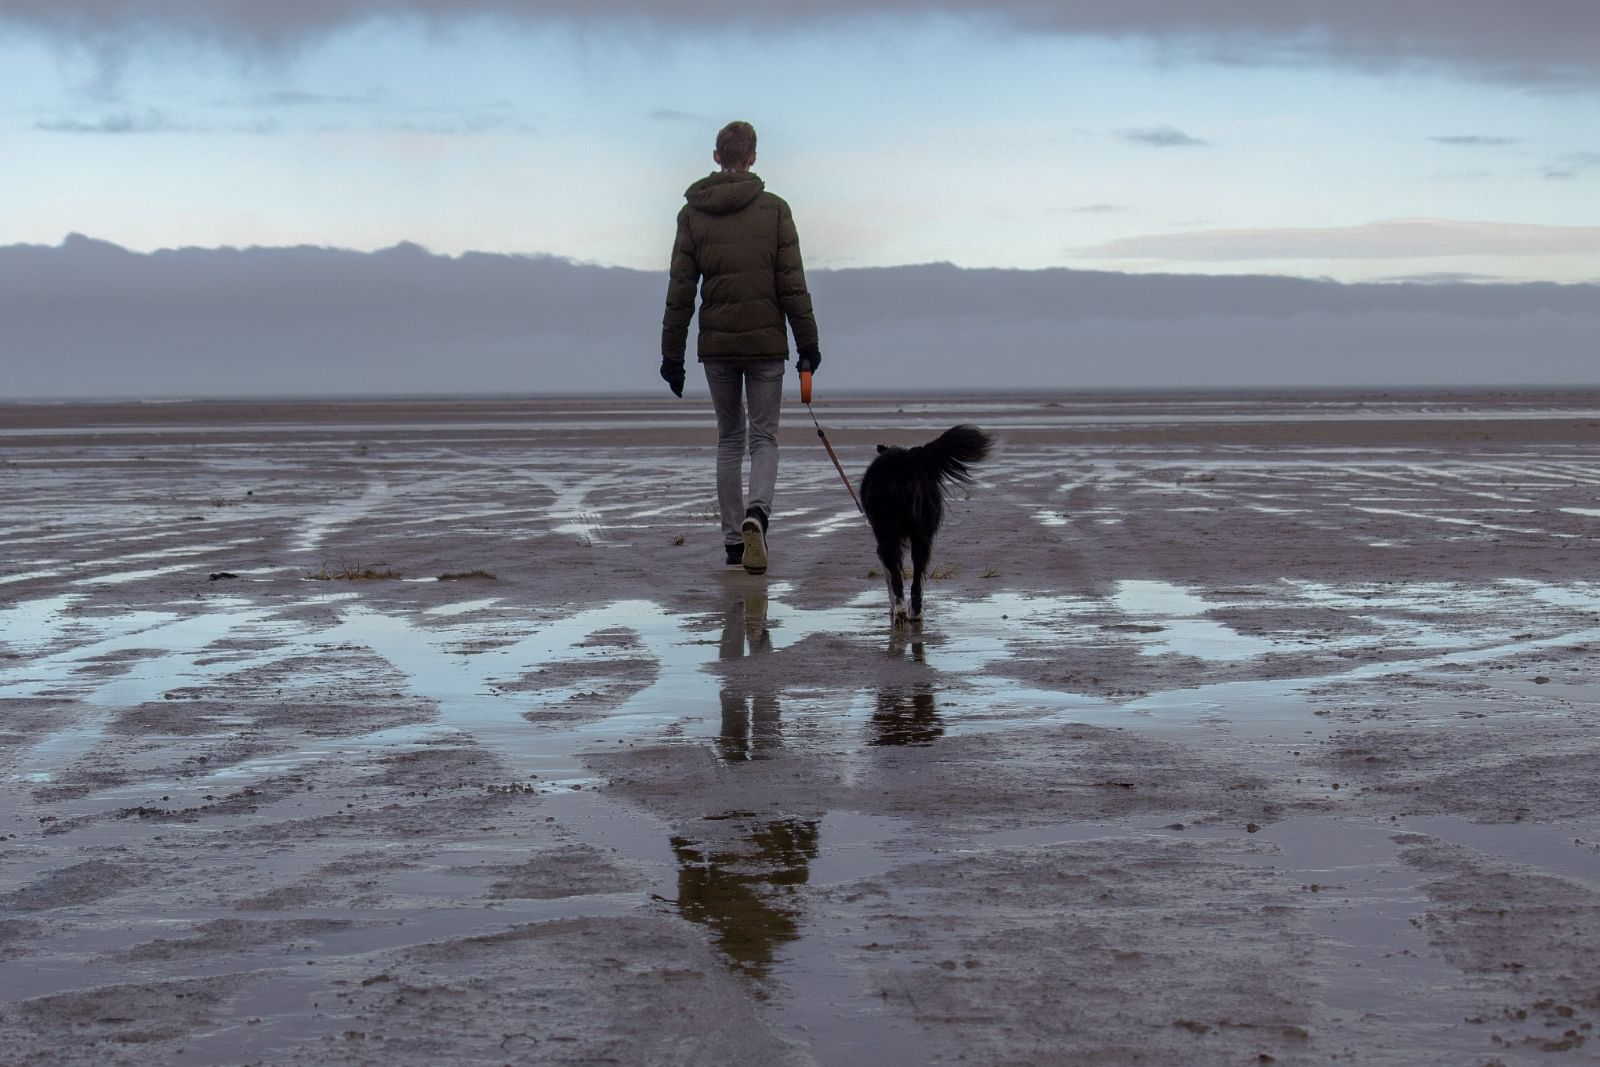 Man walking dog on beach.